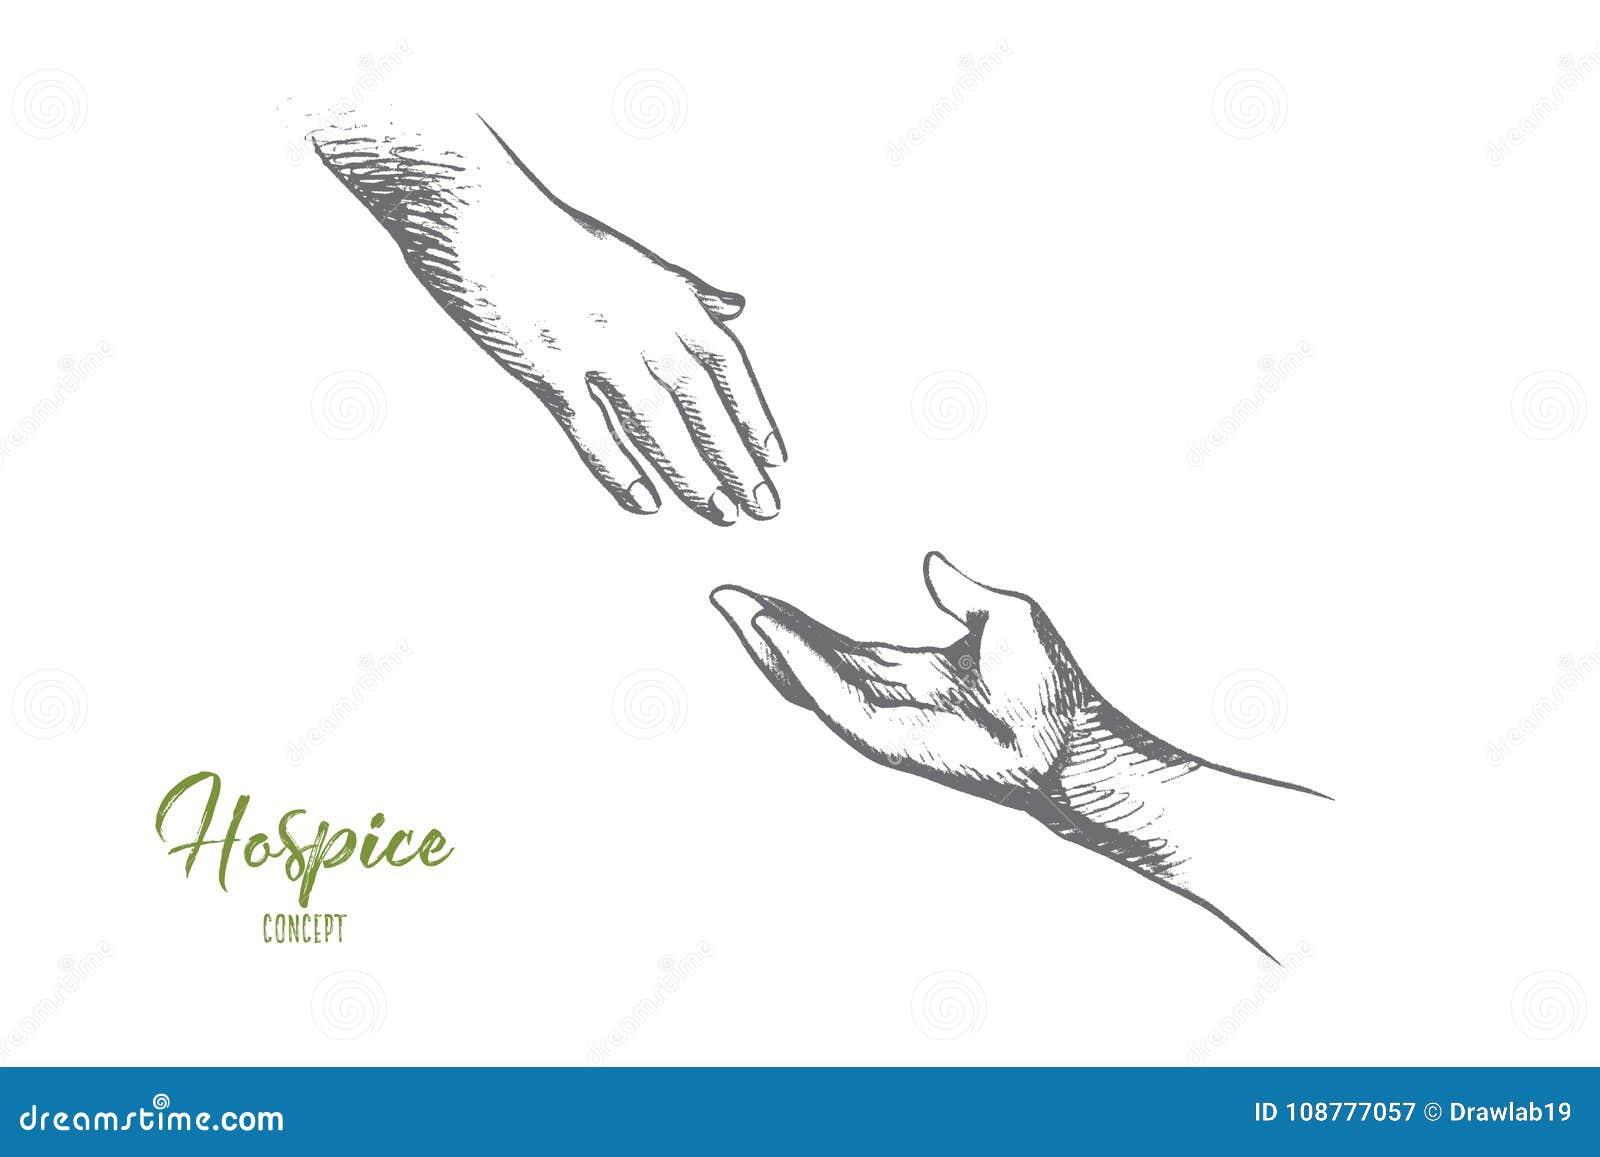 hospice cartoons  illustrations   vector stock images Brain Aneurysm Ribbon Decal Brain Aneurysm Ribbon Clip Art